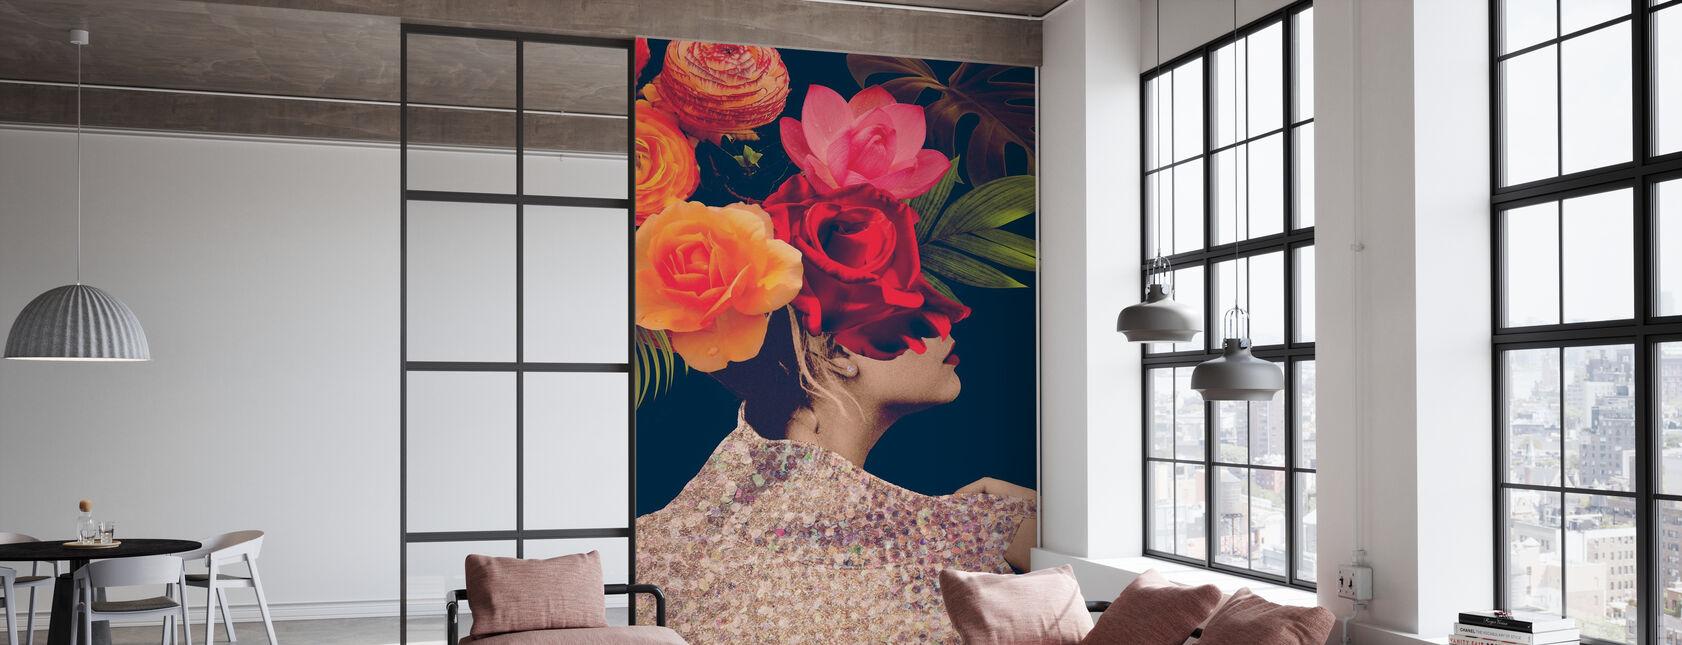 Fleur Collage - Wallpaper - Office